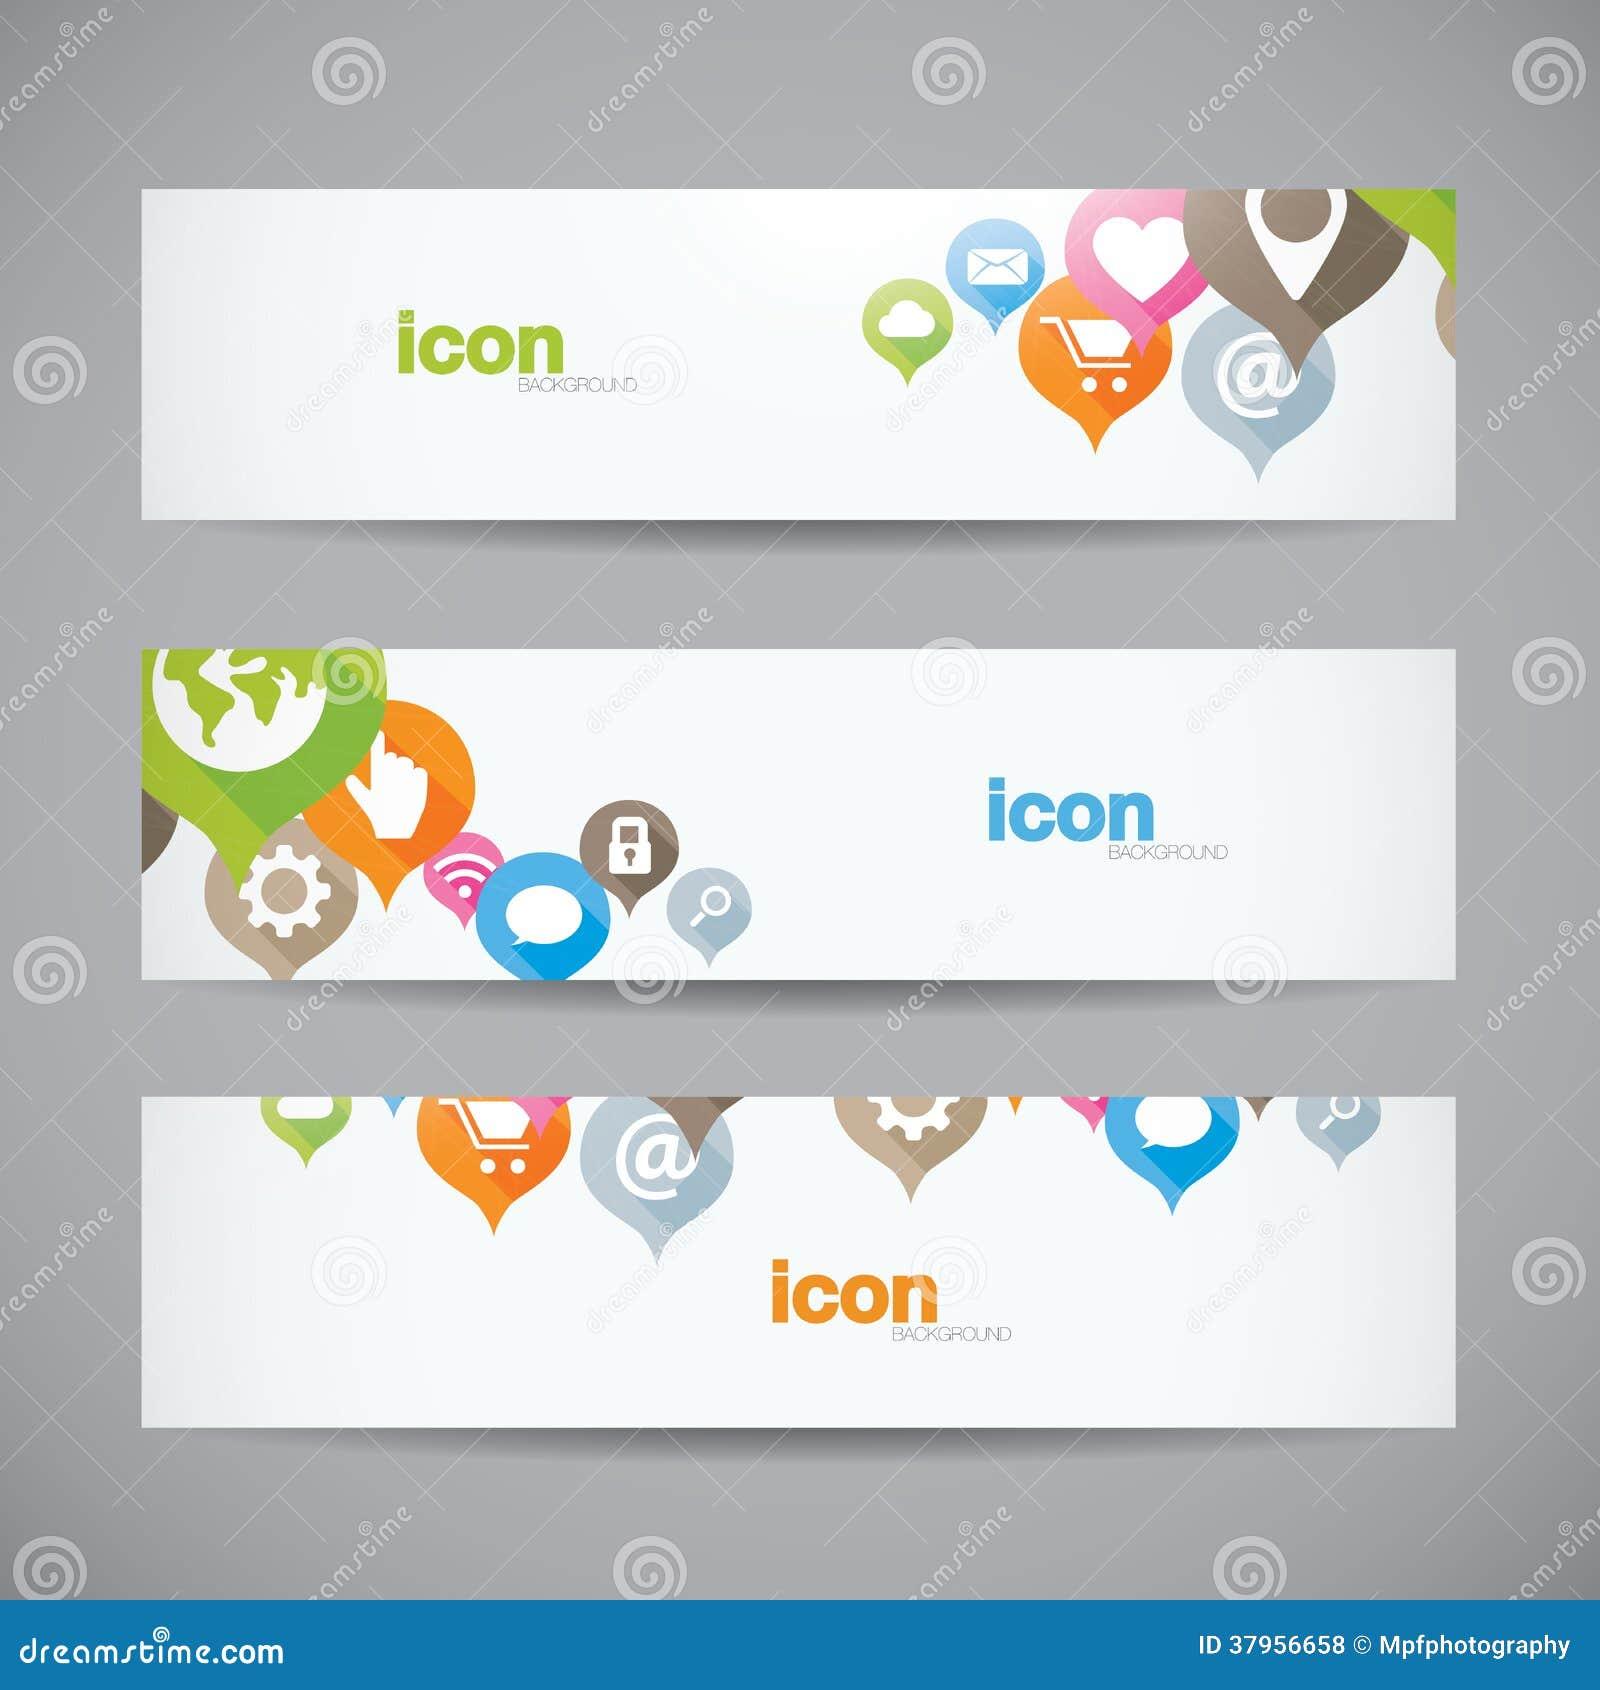 creative abstract background web icon banner heade royalty free stock photos